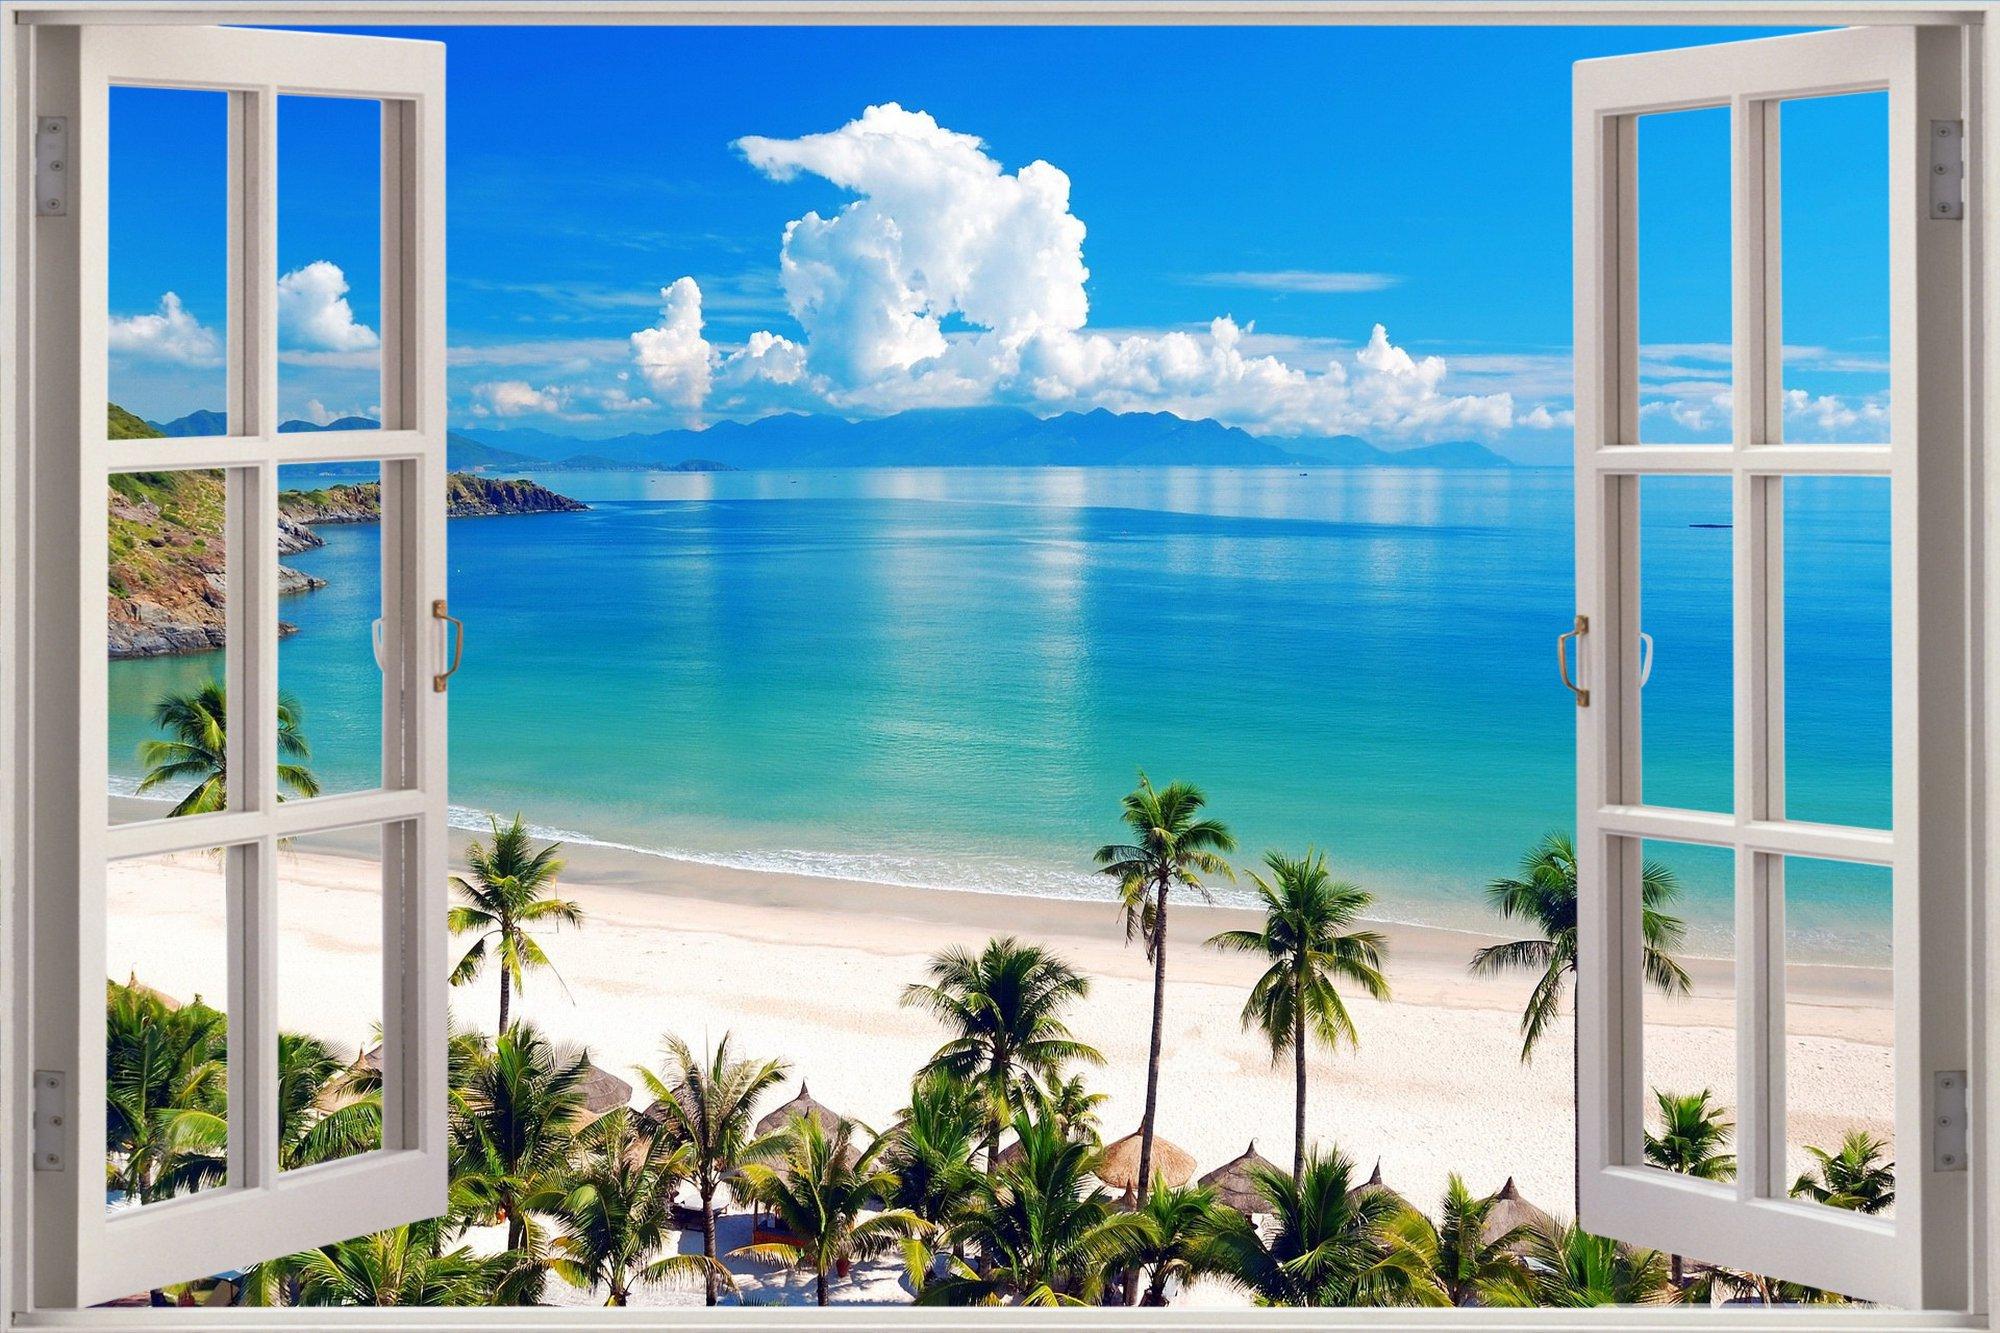 Window Exotic Ocean Beach View Wall Stickers Film Art Decal Wallpaper 2000x1333